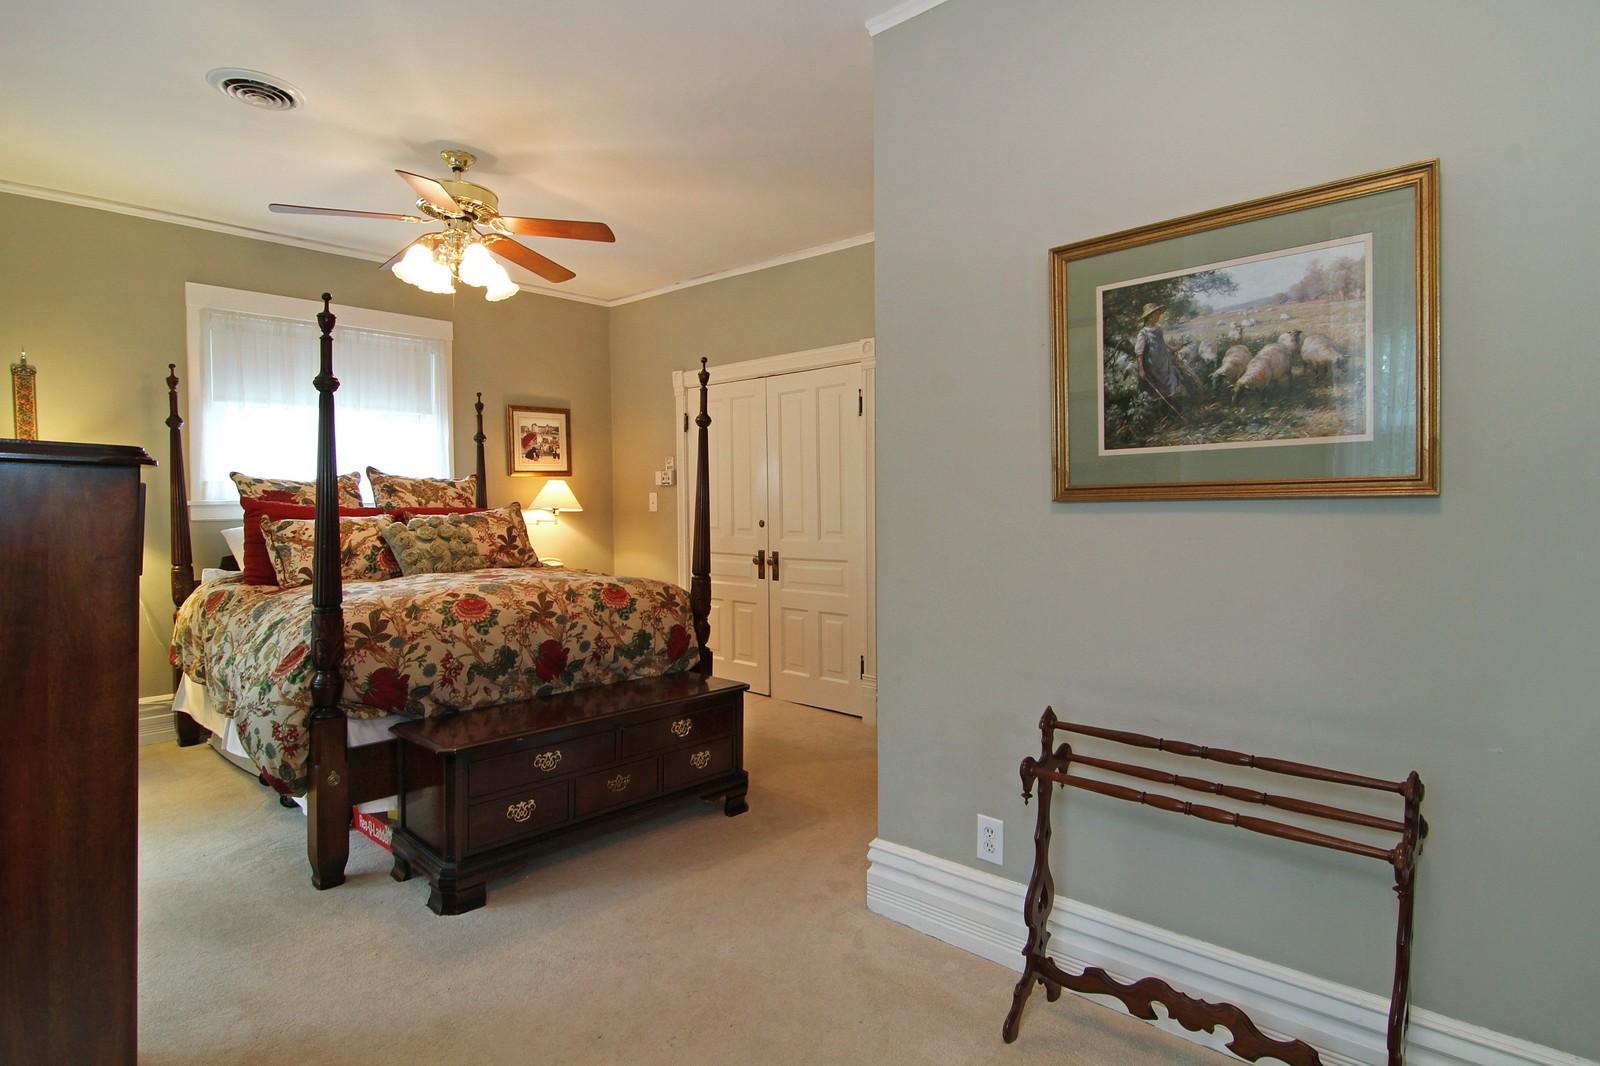 Real Estate Photography - 228 LaGrange Rd, La Grange, IL, 60525 - Master Bedroom